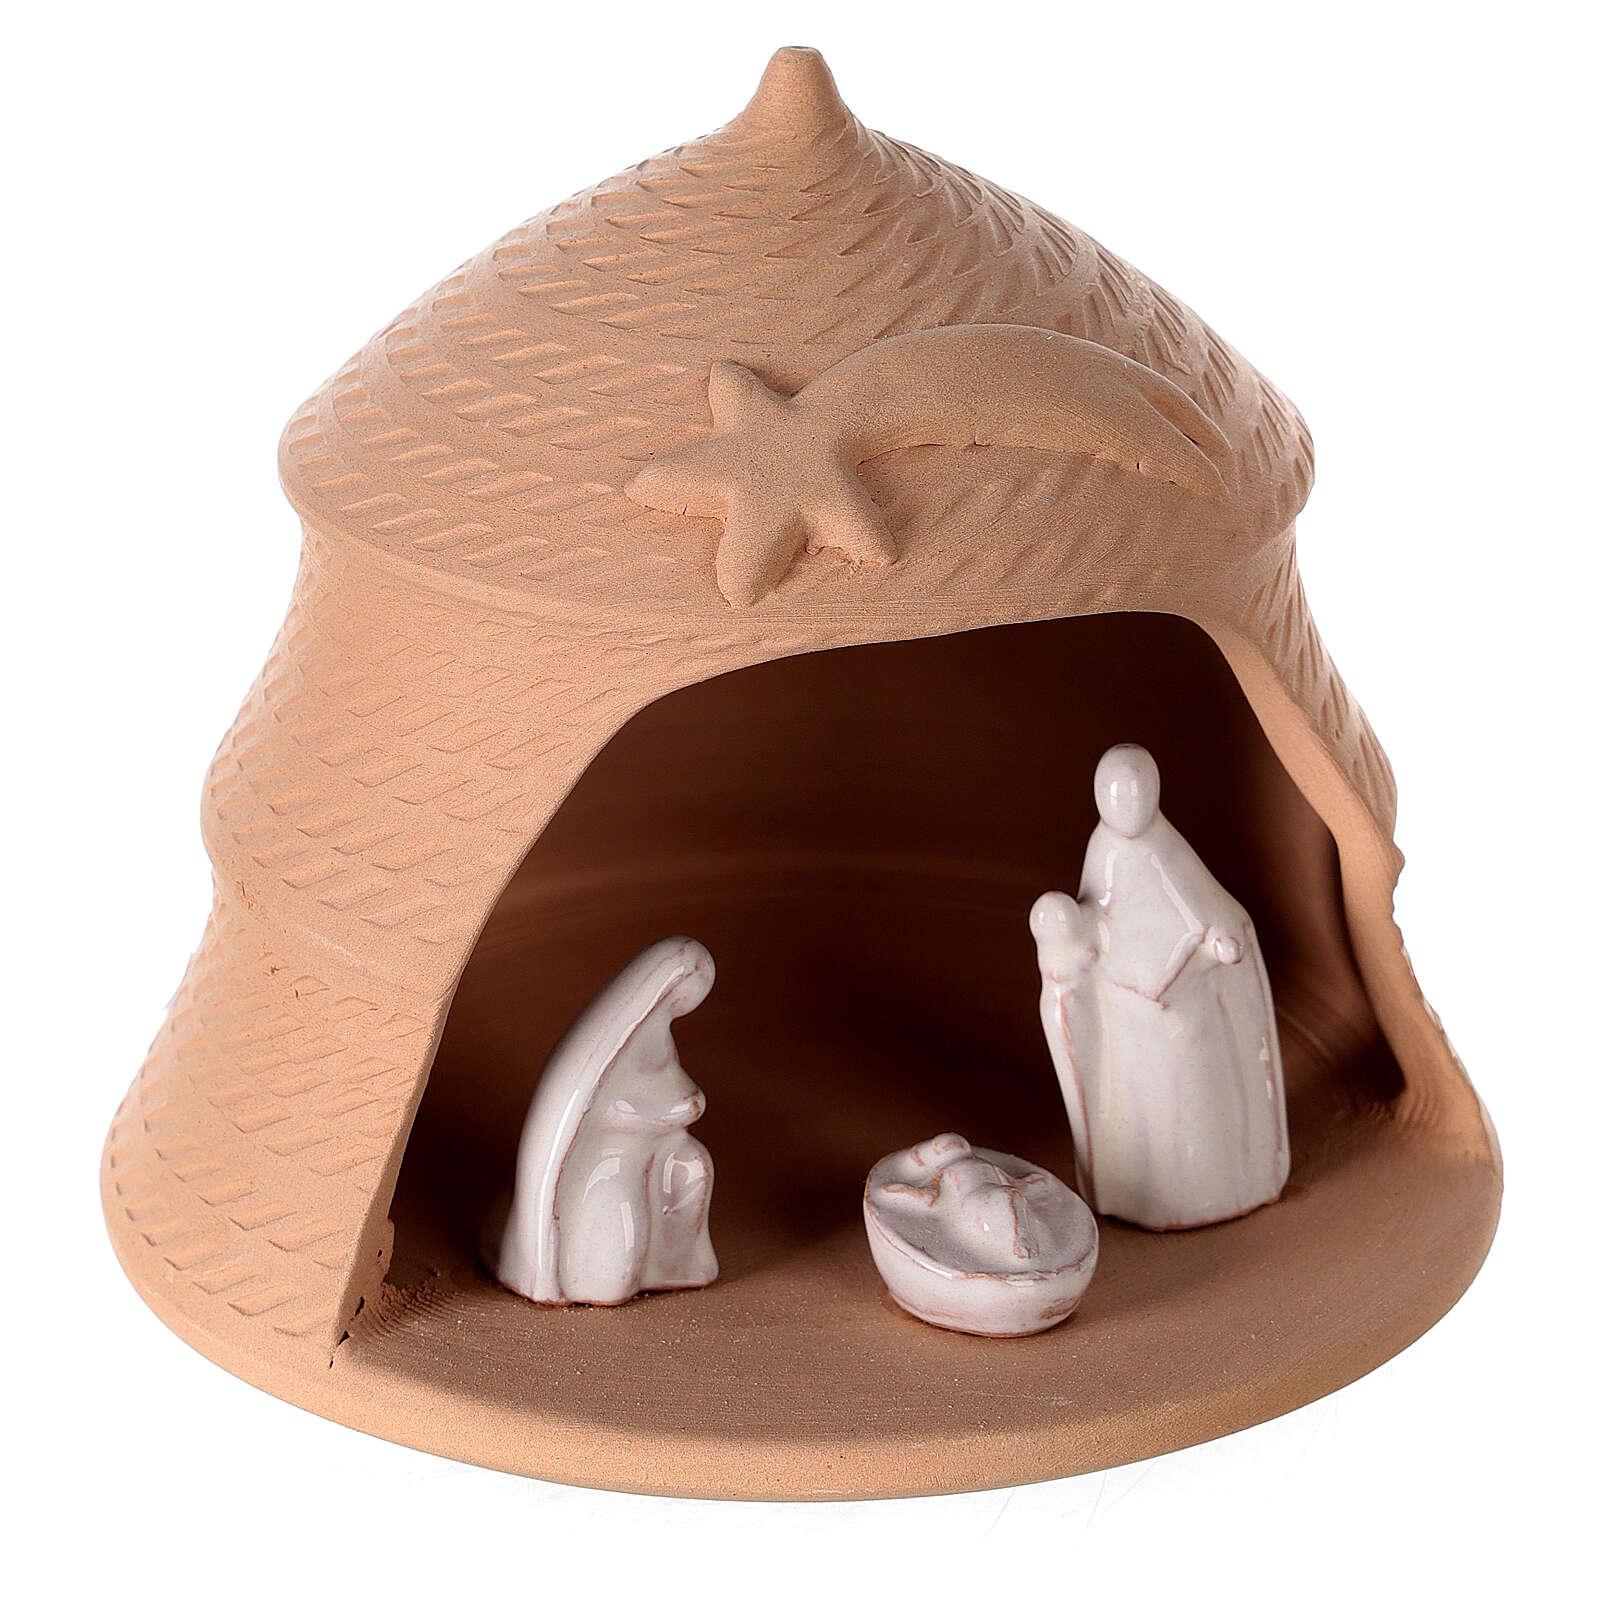 Nativity scene in pine natural white Deruta terracotta 12 cm 4